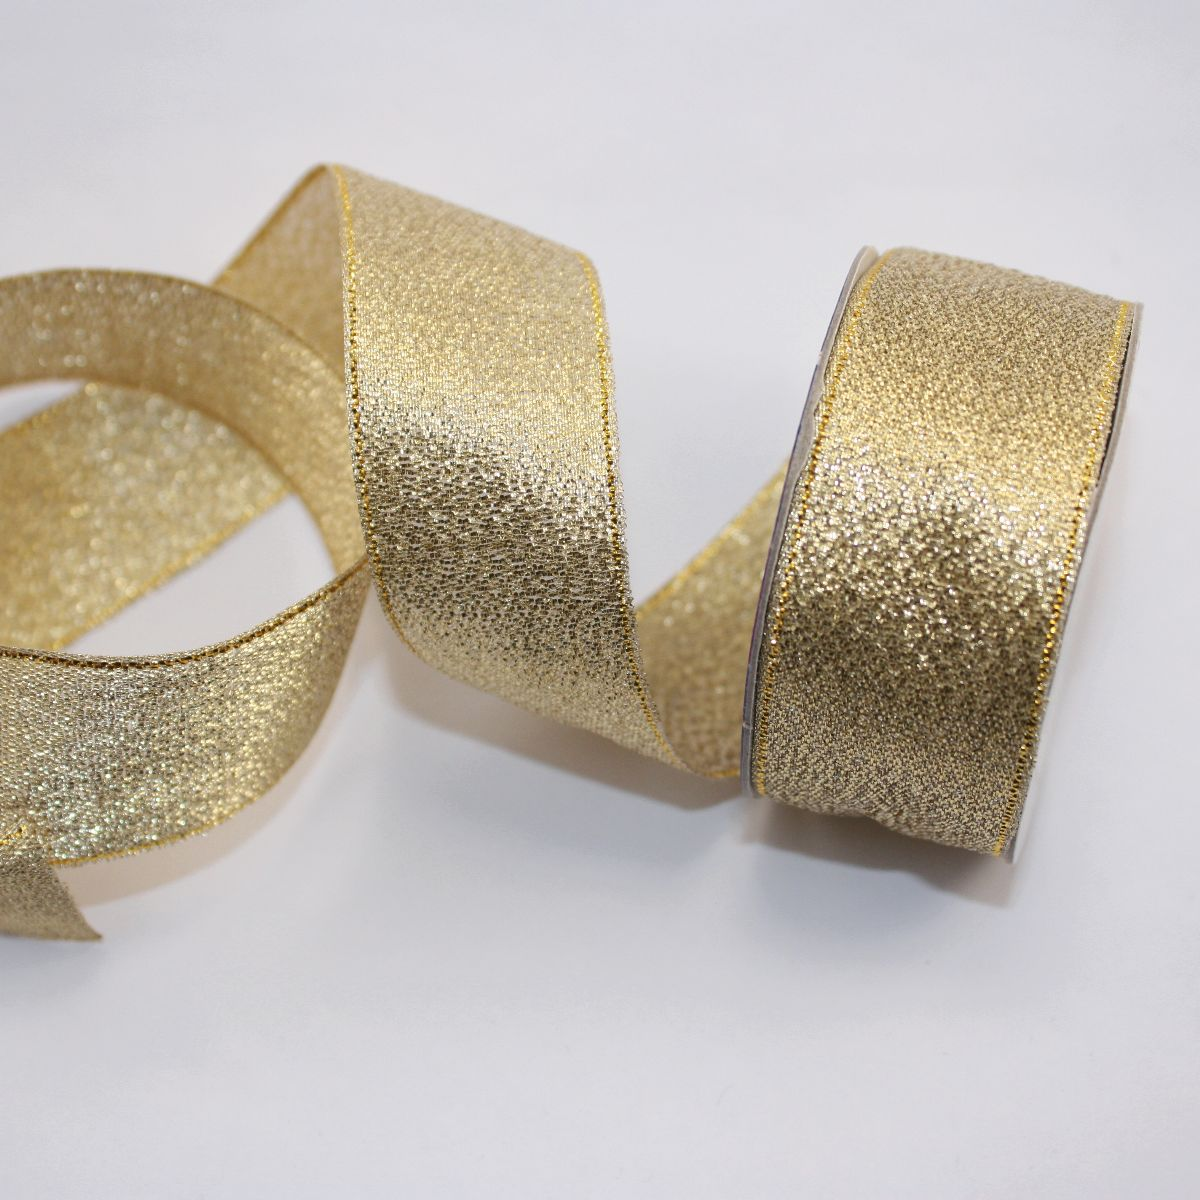 Ruban fantaisie en bobine doré 26 mm